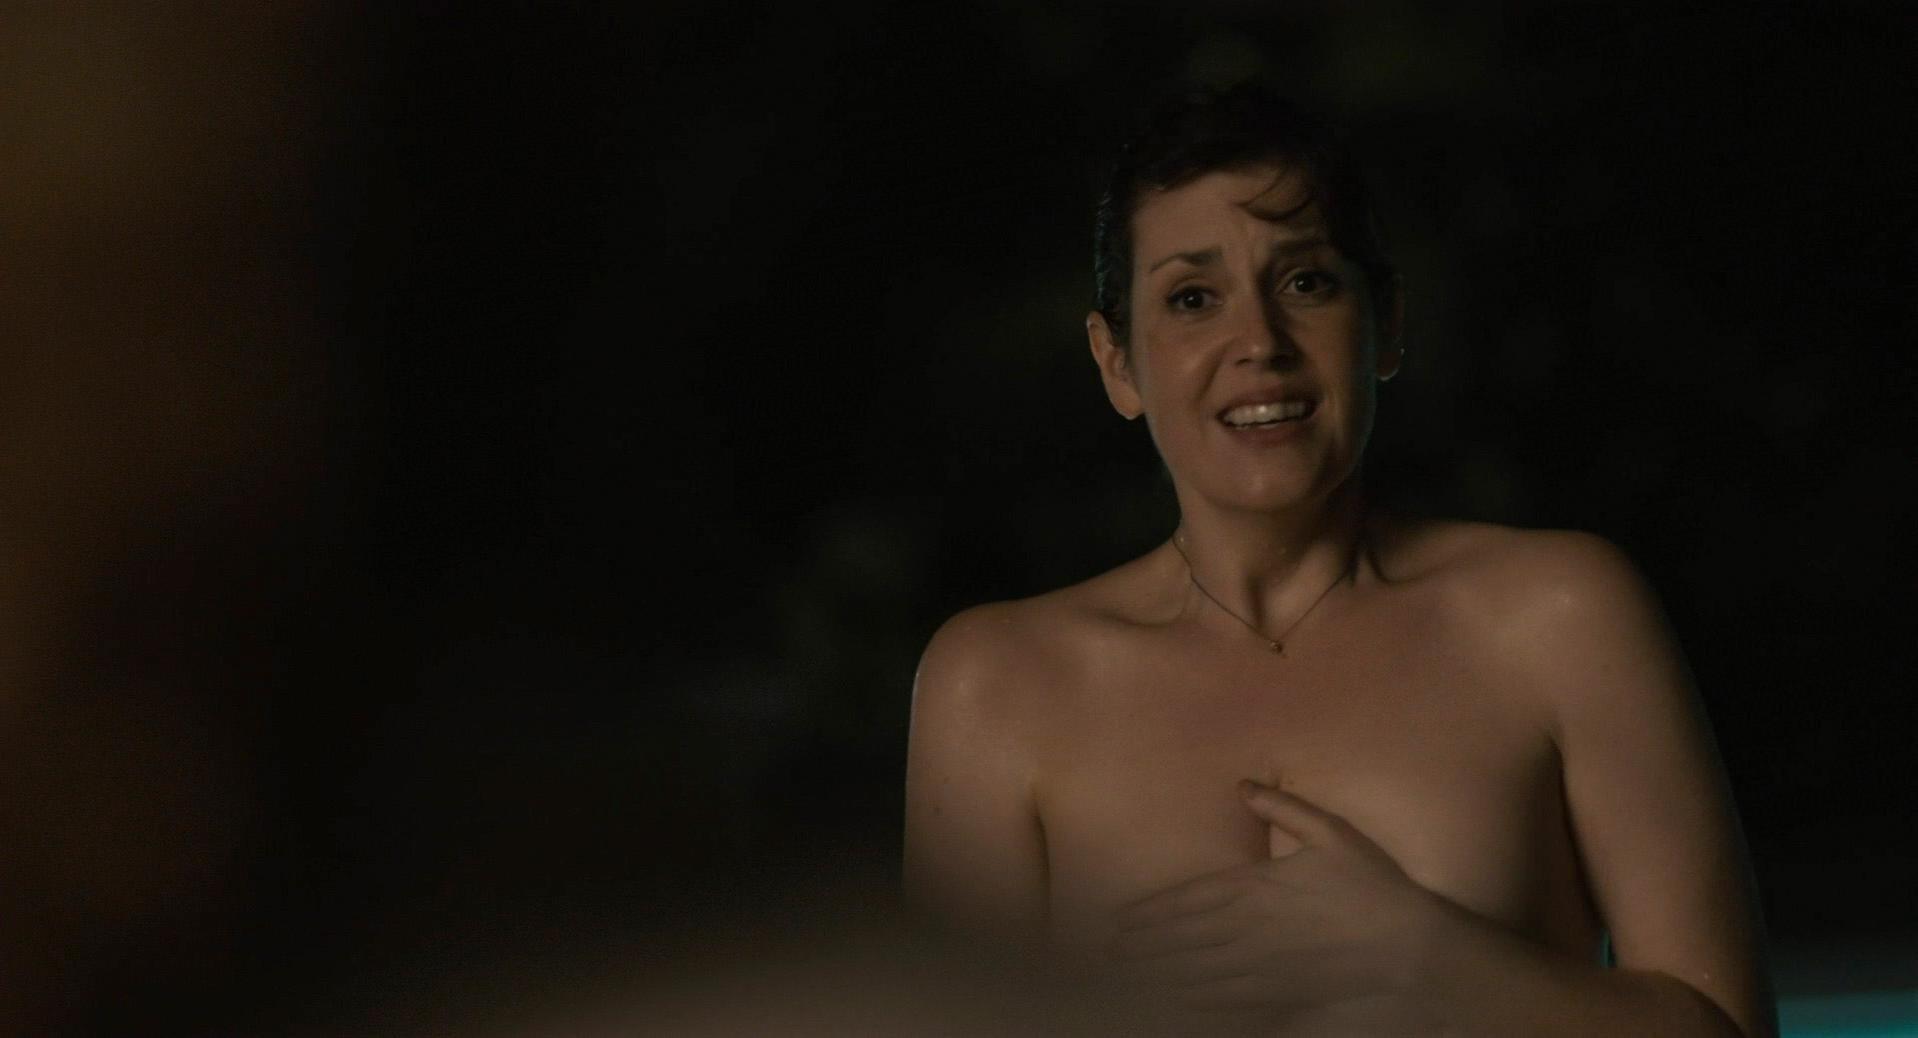 melanie lynskey nude video